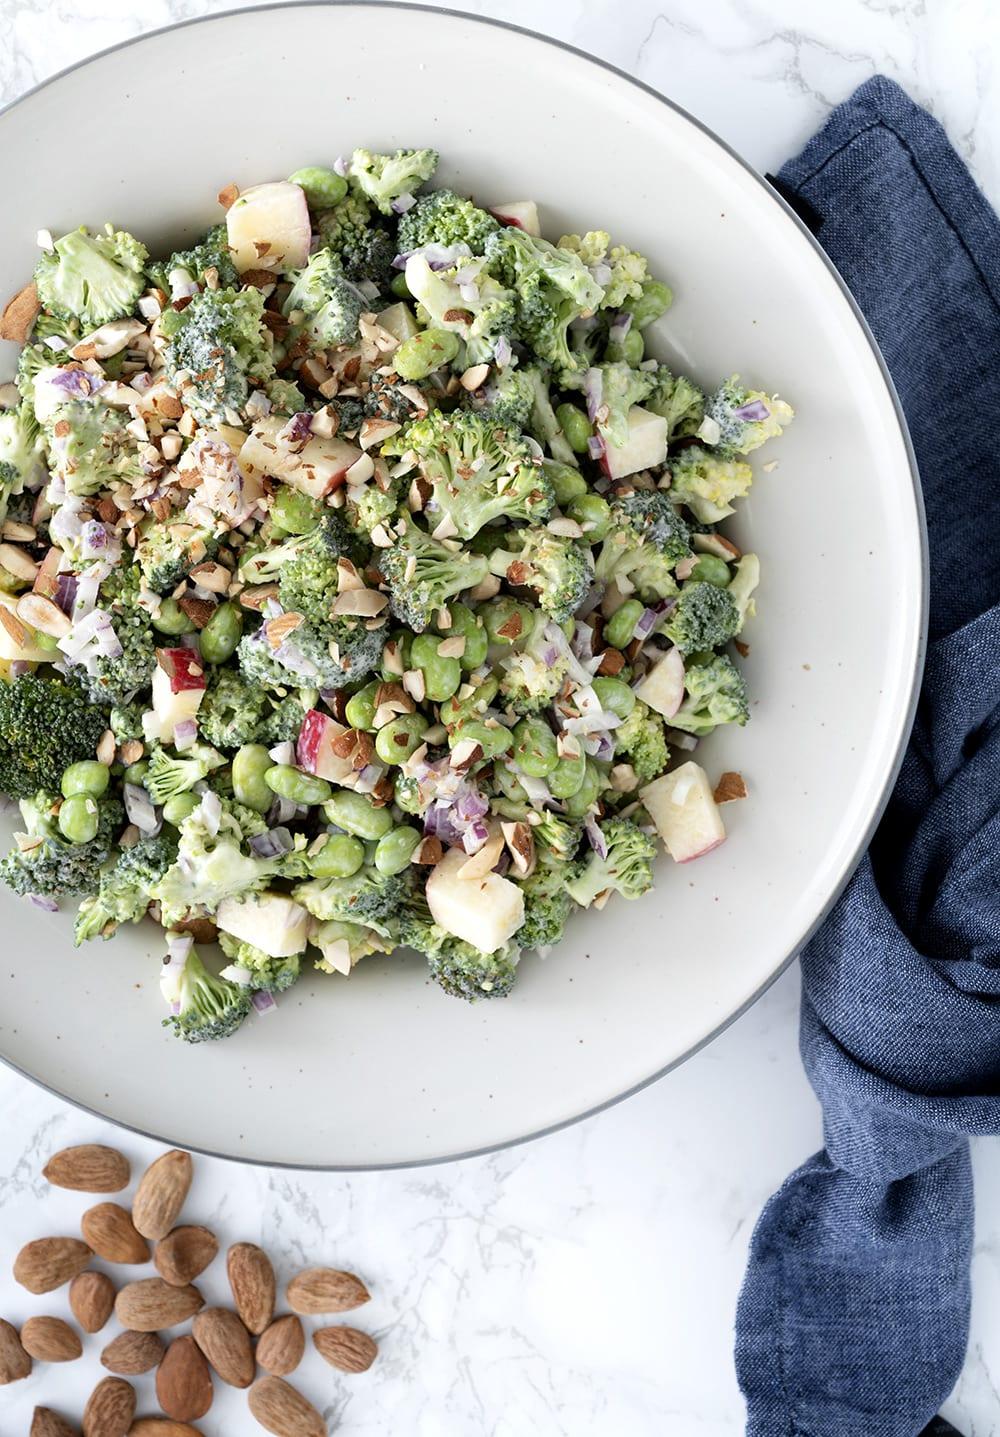 cremet broccoli med edamame